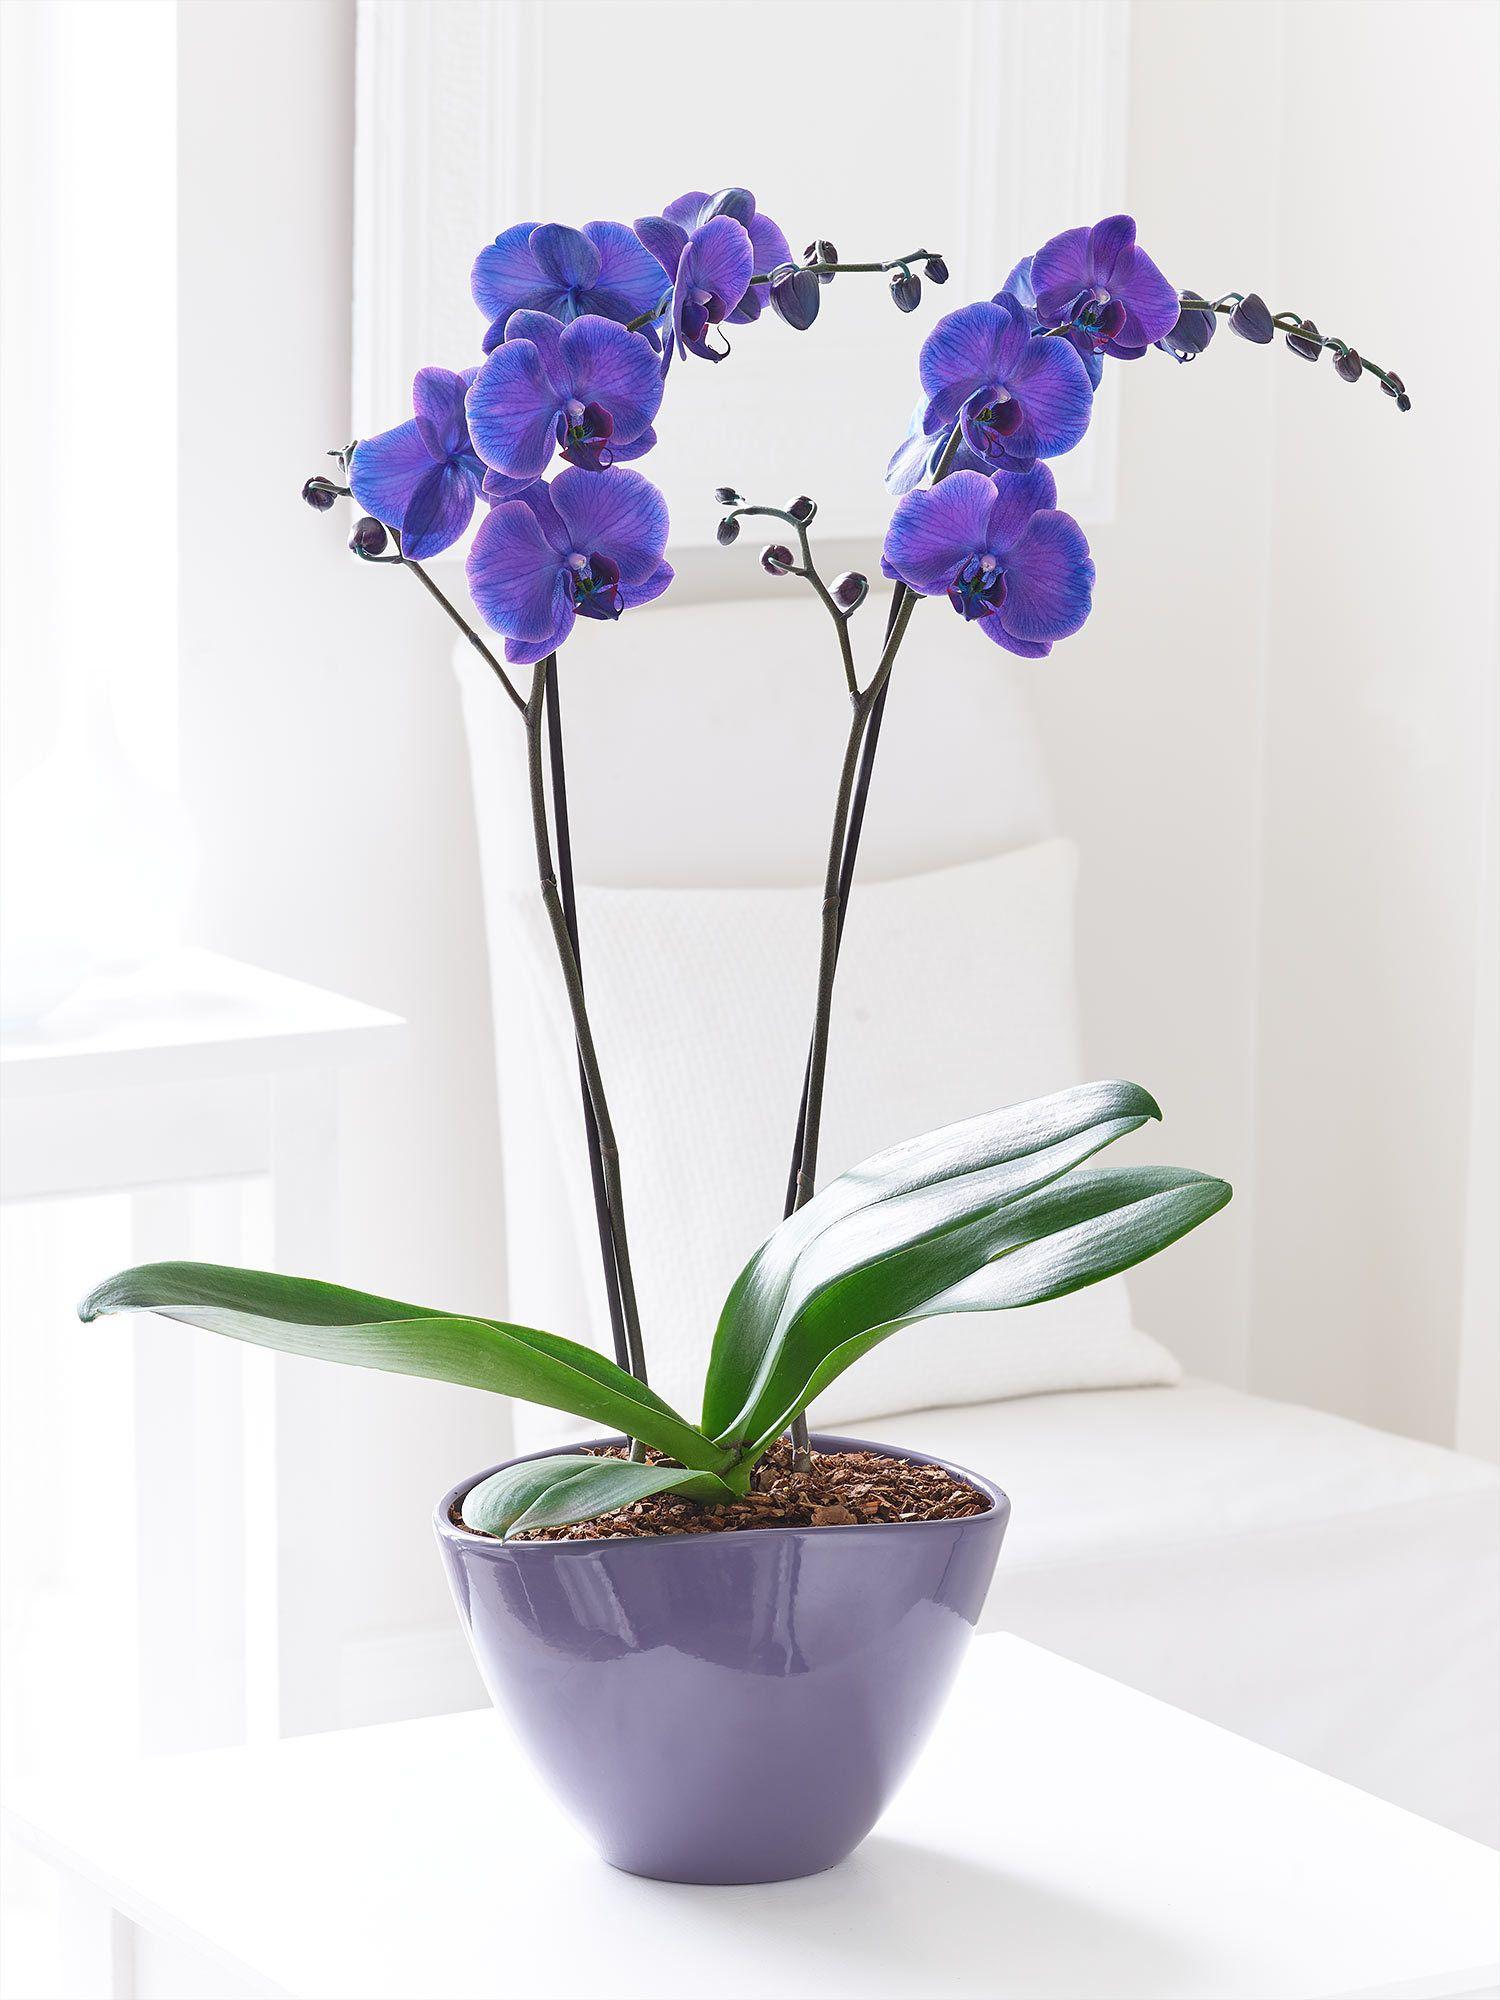 48 Interflora Floral Belleza